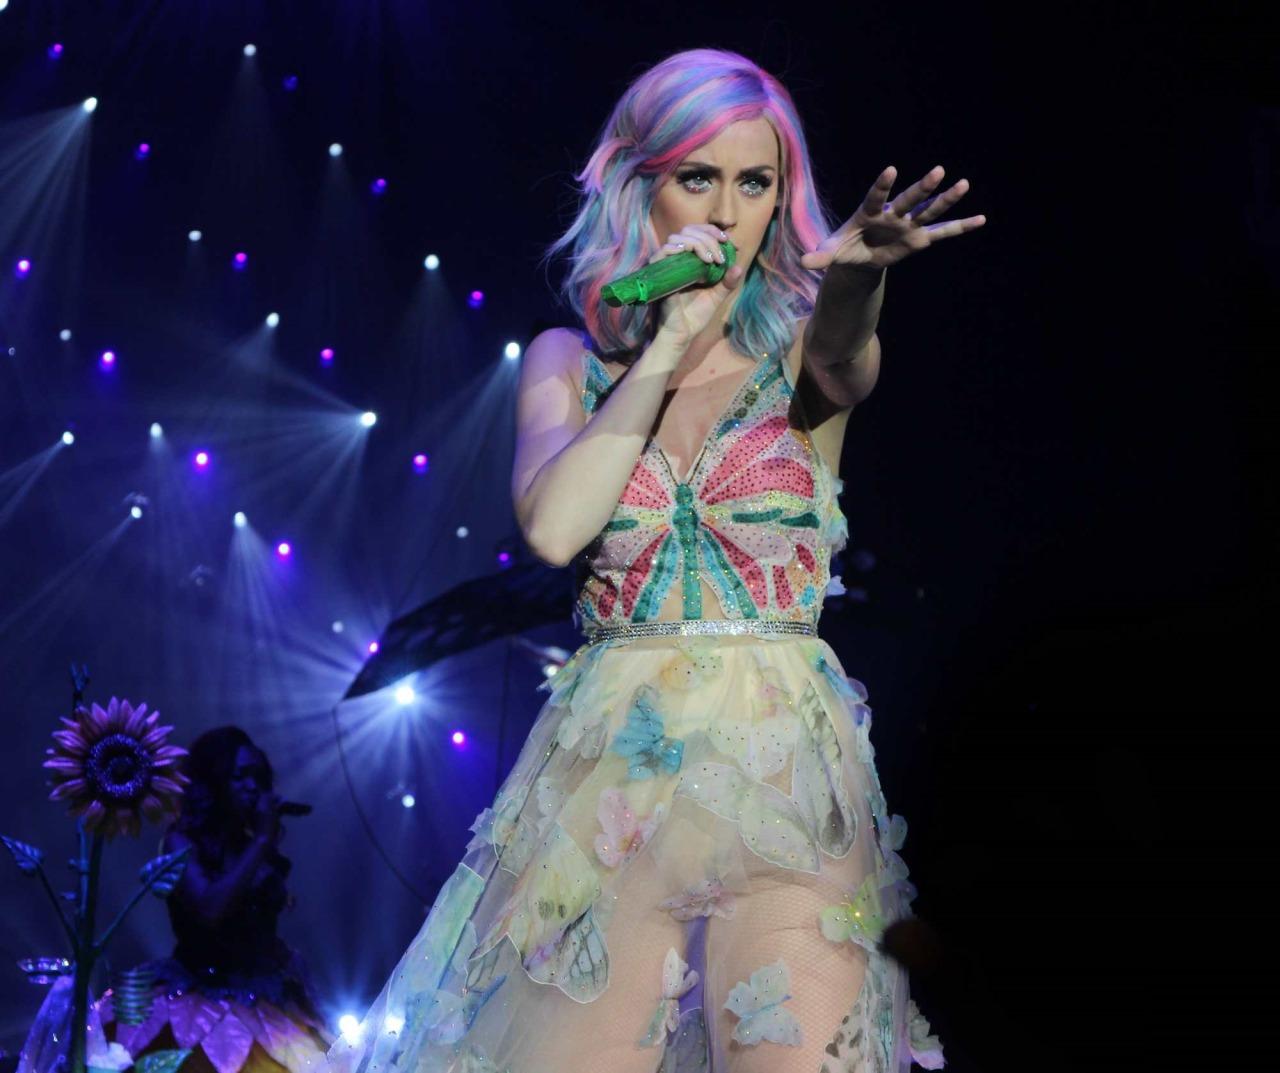 Katy Perry >> The Prismatic World Tour Tumblr_n58y4xKX7V1qc70kwo3_1280